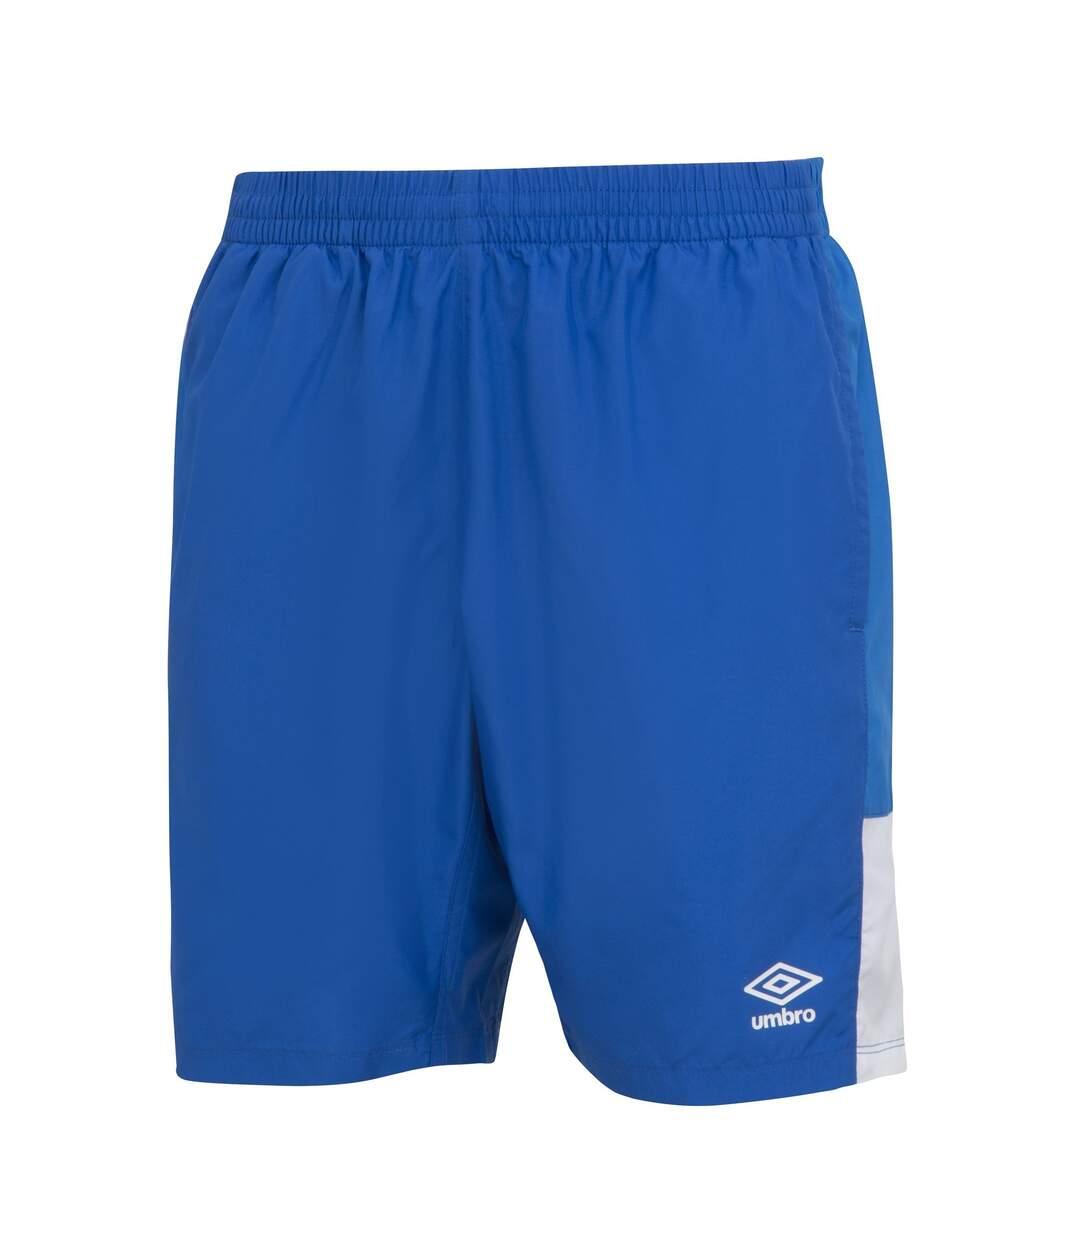 Umbro Mens Training Shorts (Royal Blue/French Blue/White) - UTGD111